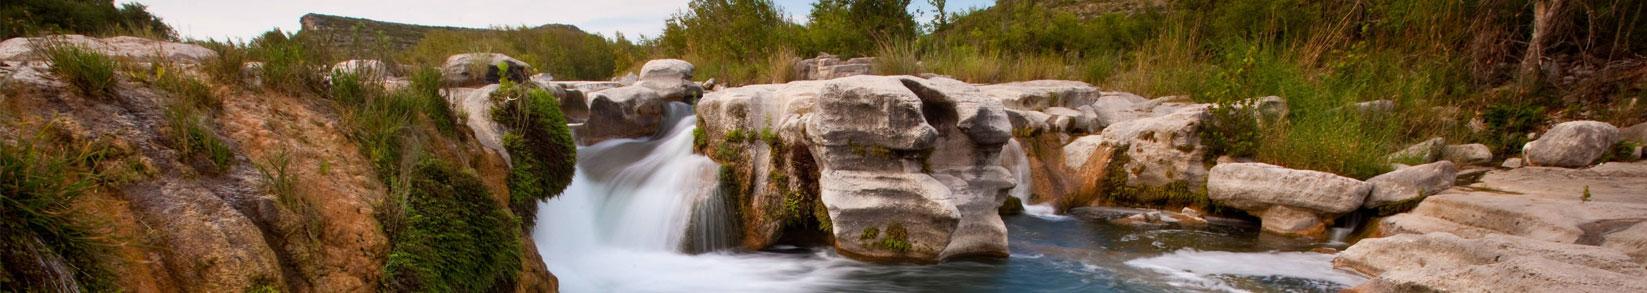 Dolan Falls Preserve